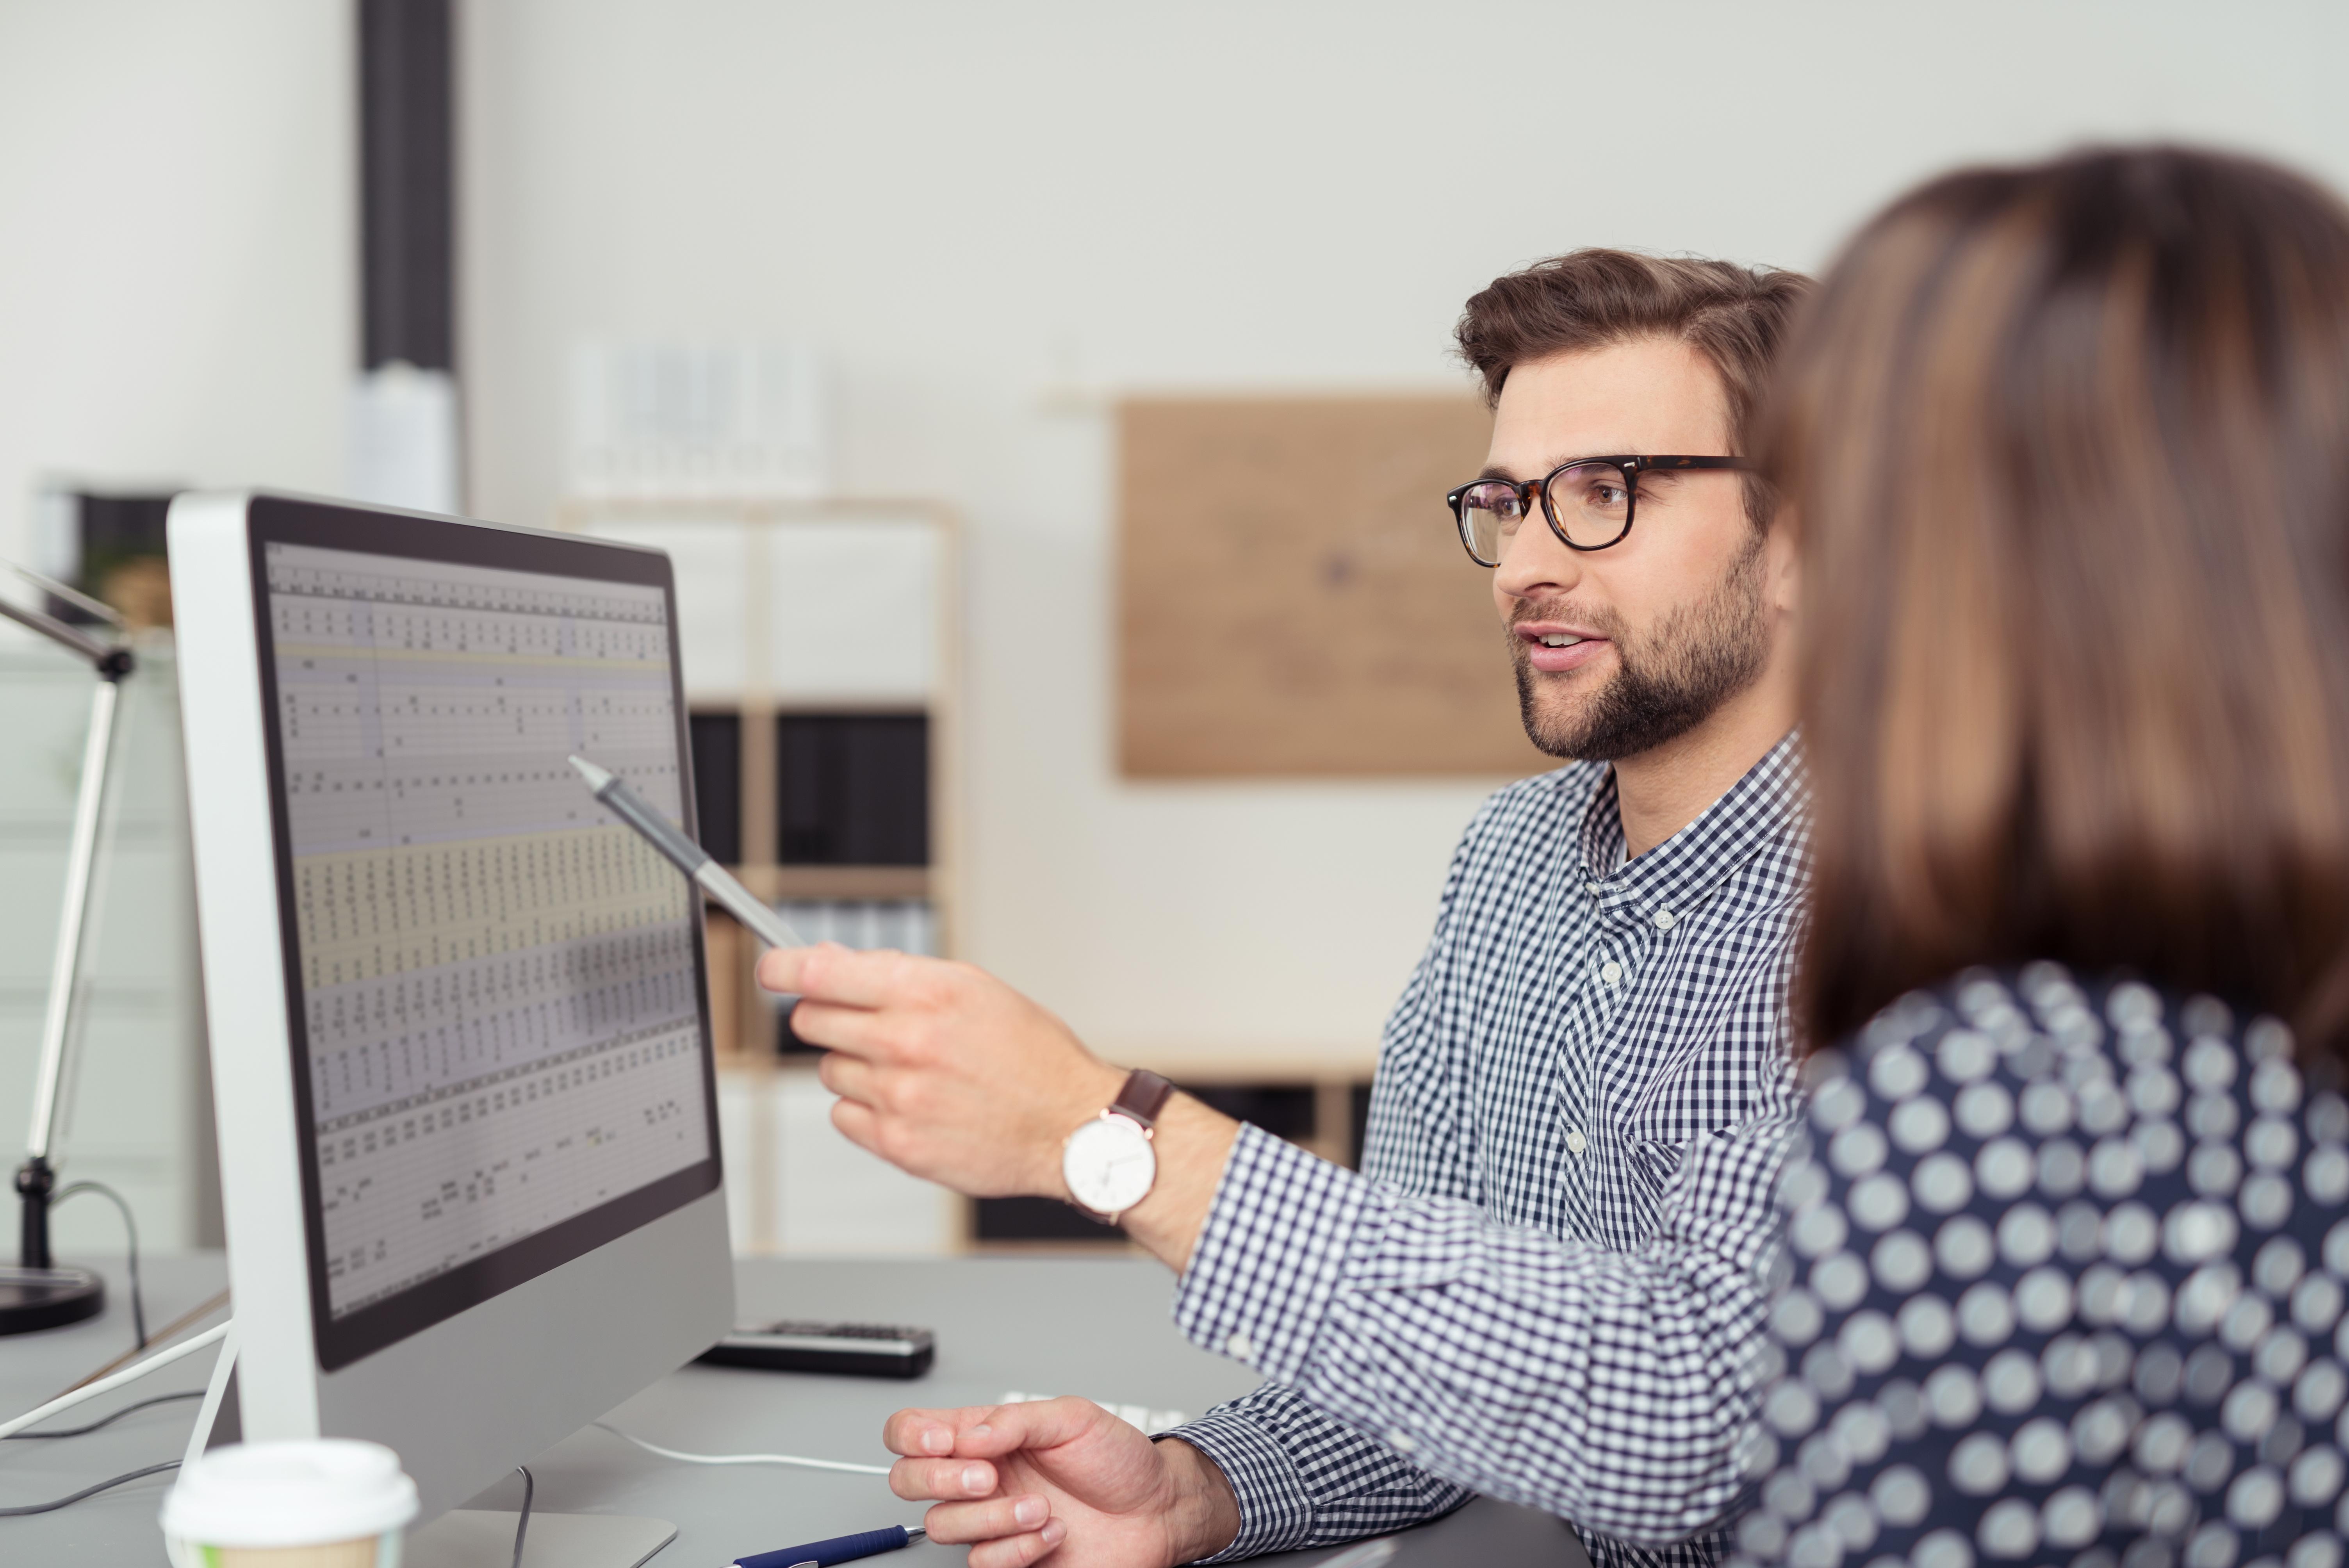 man-training-woman-on-computer